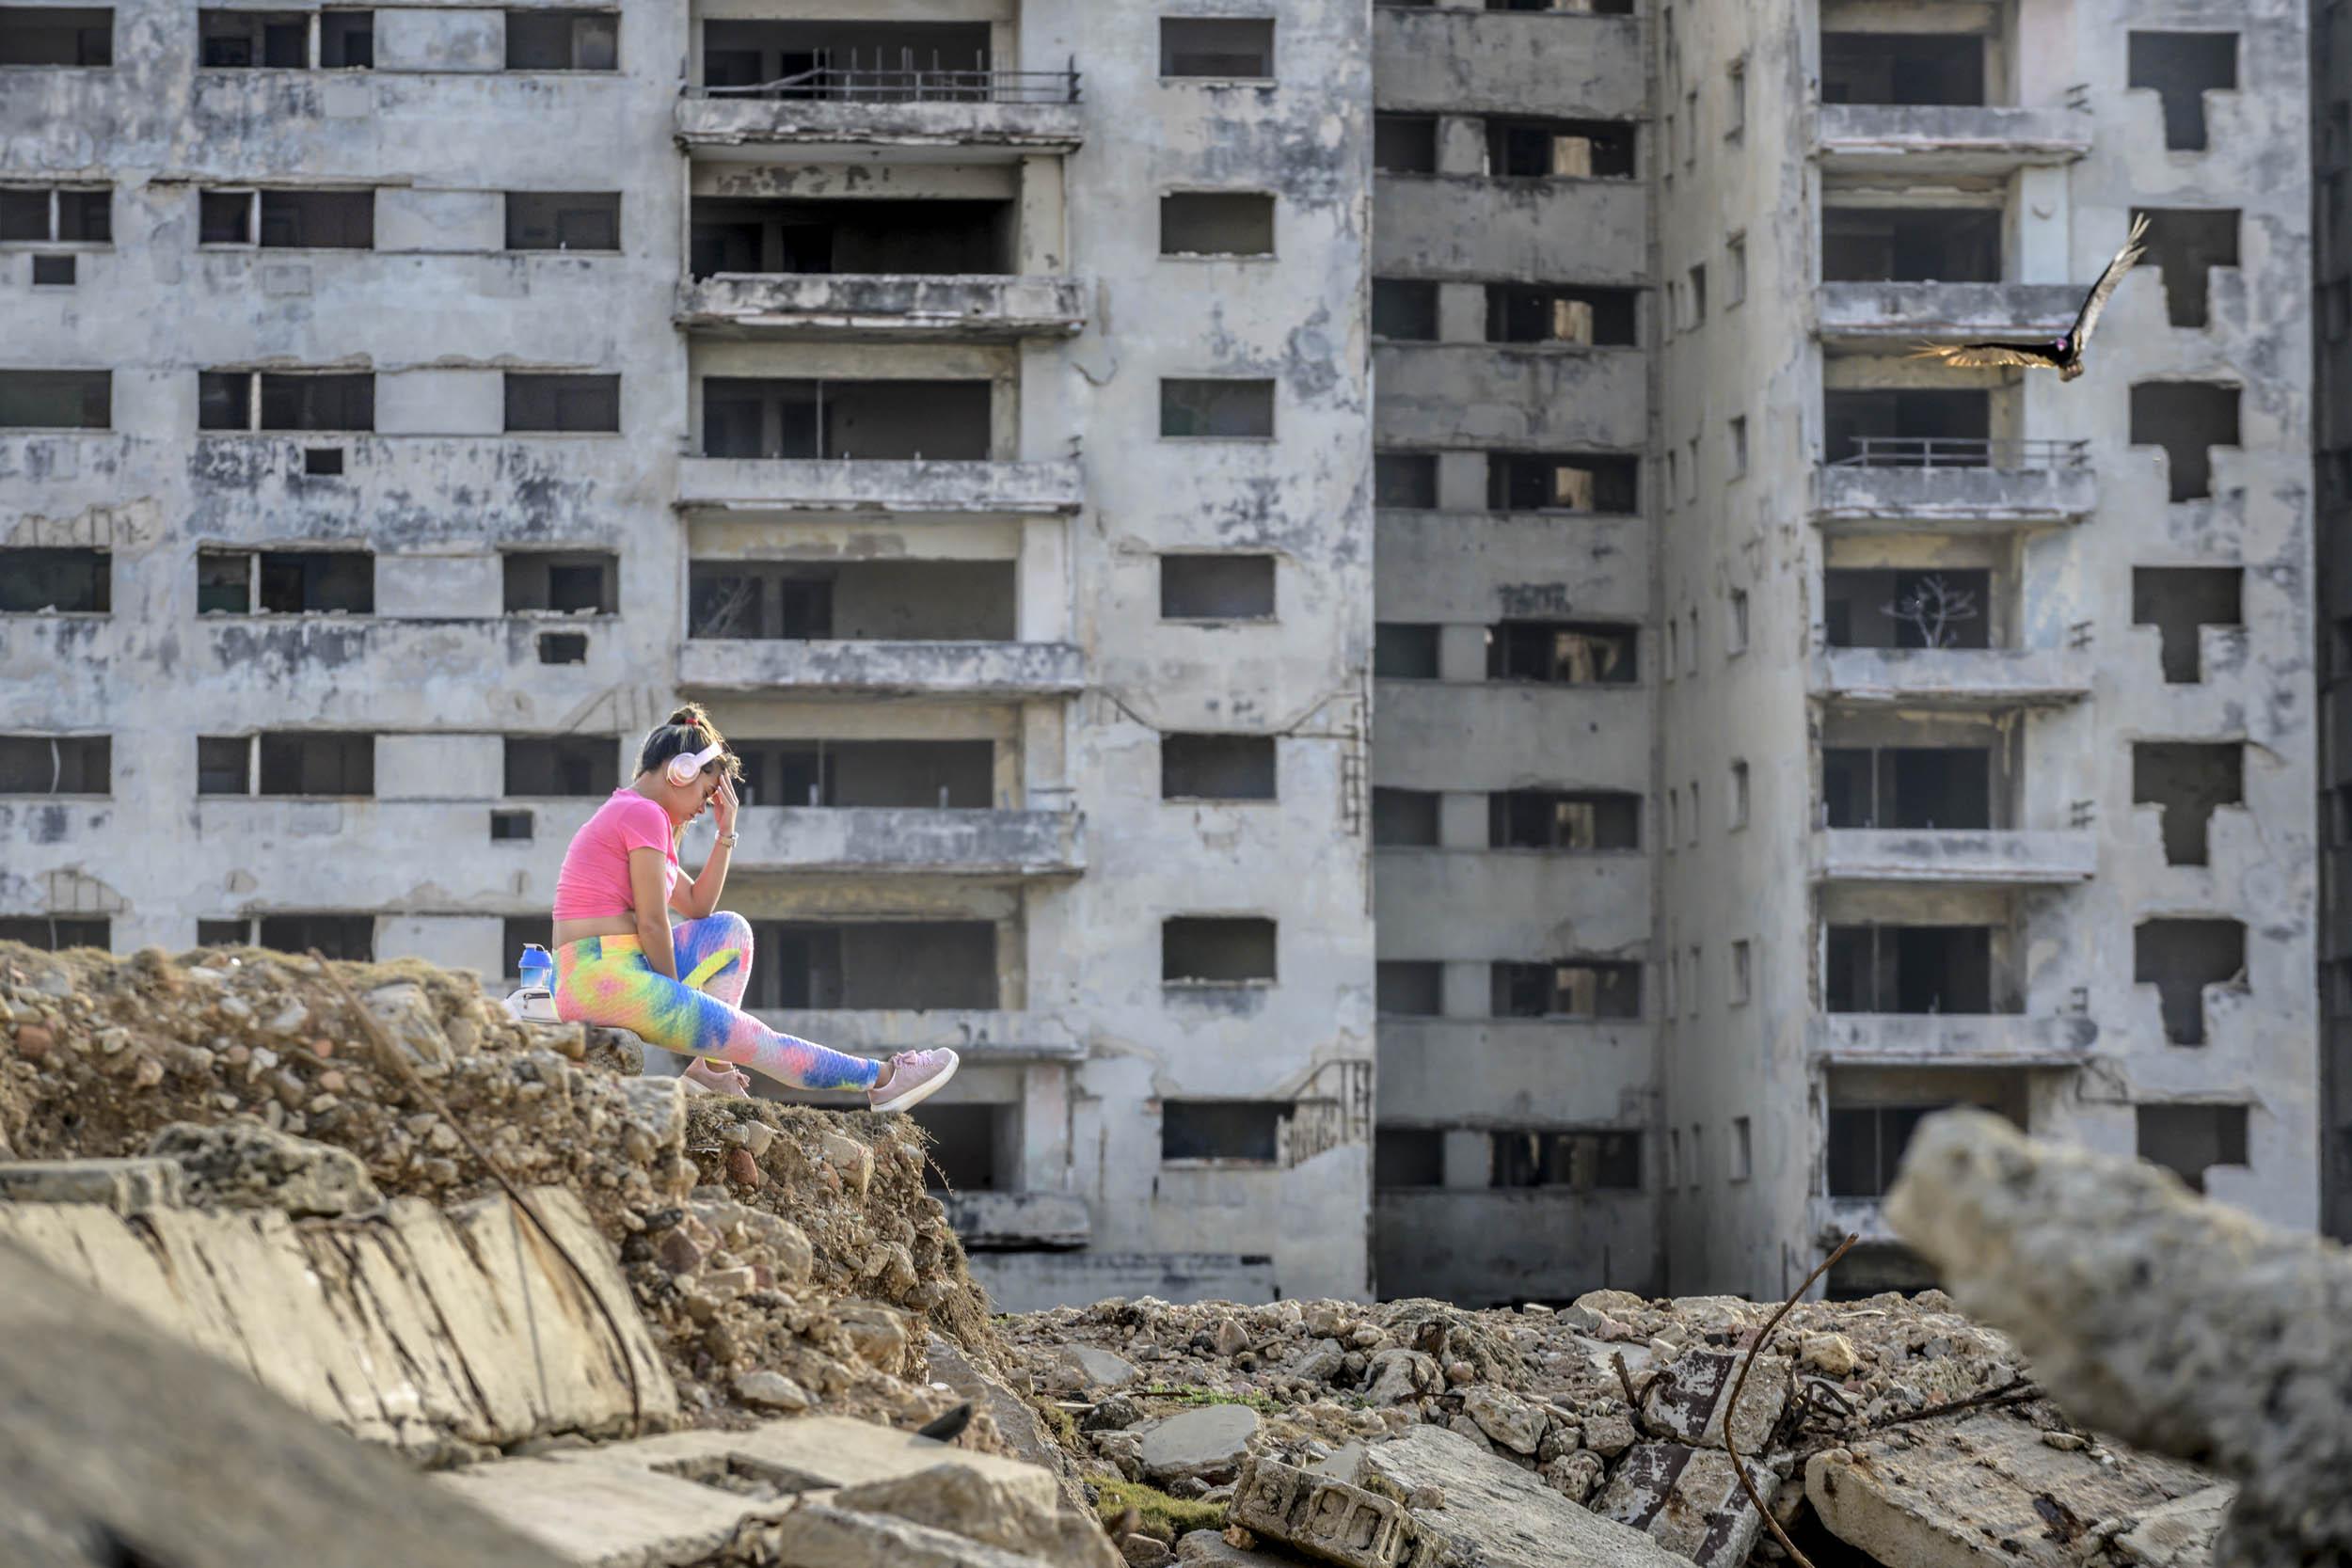 Aura 2 - Cuba - Hector Garrido, Aerial and human photography